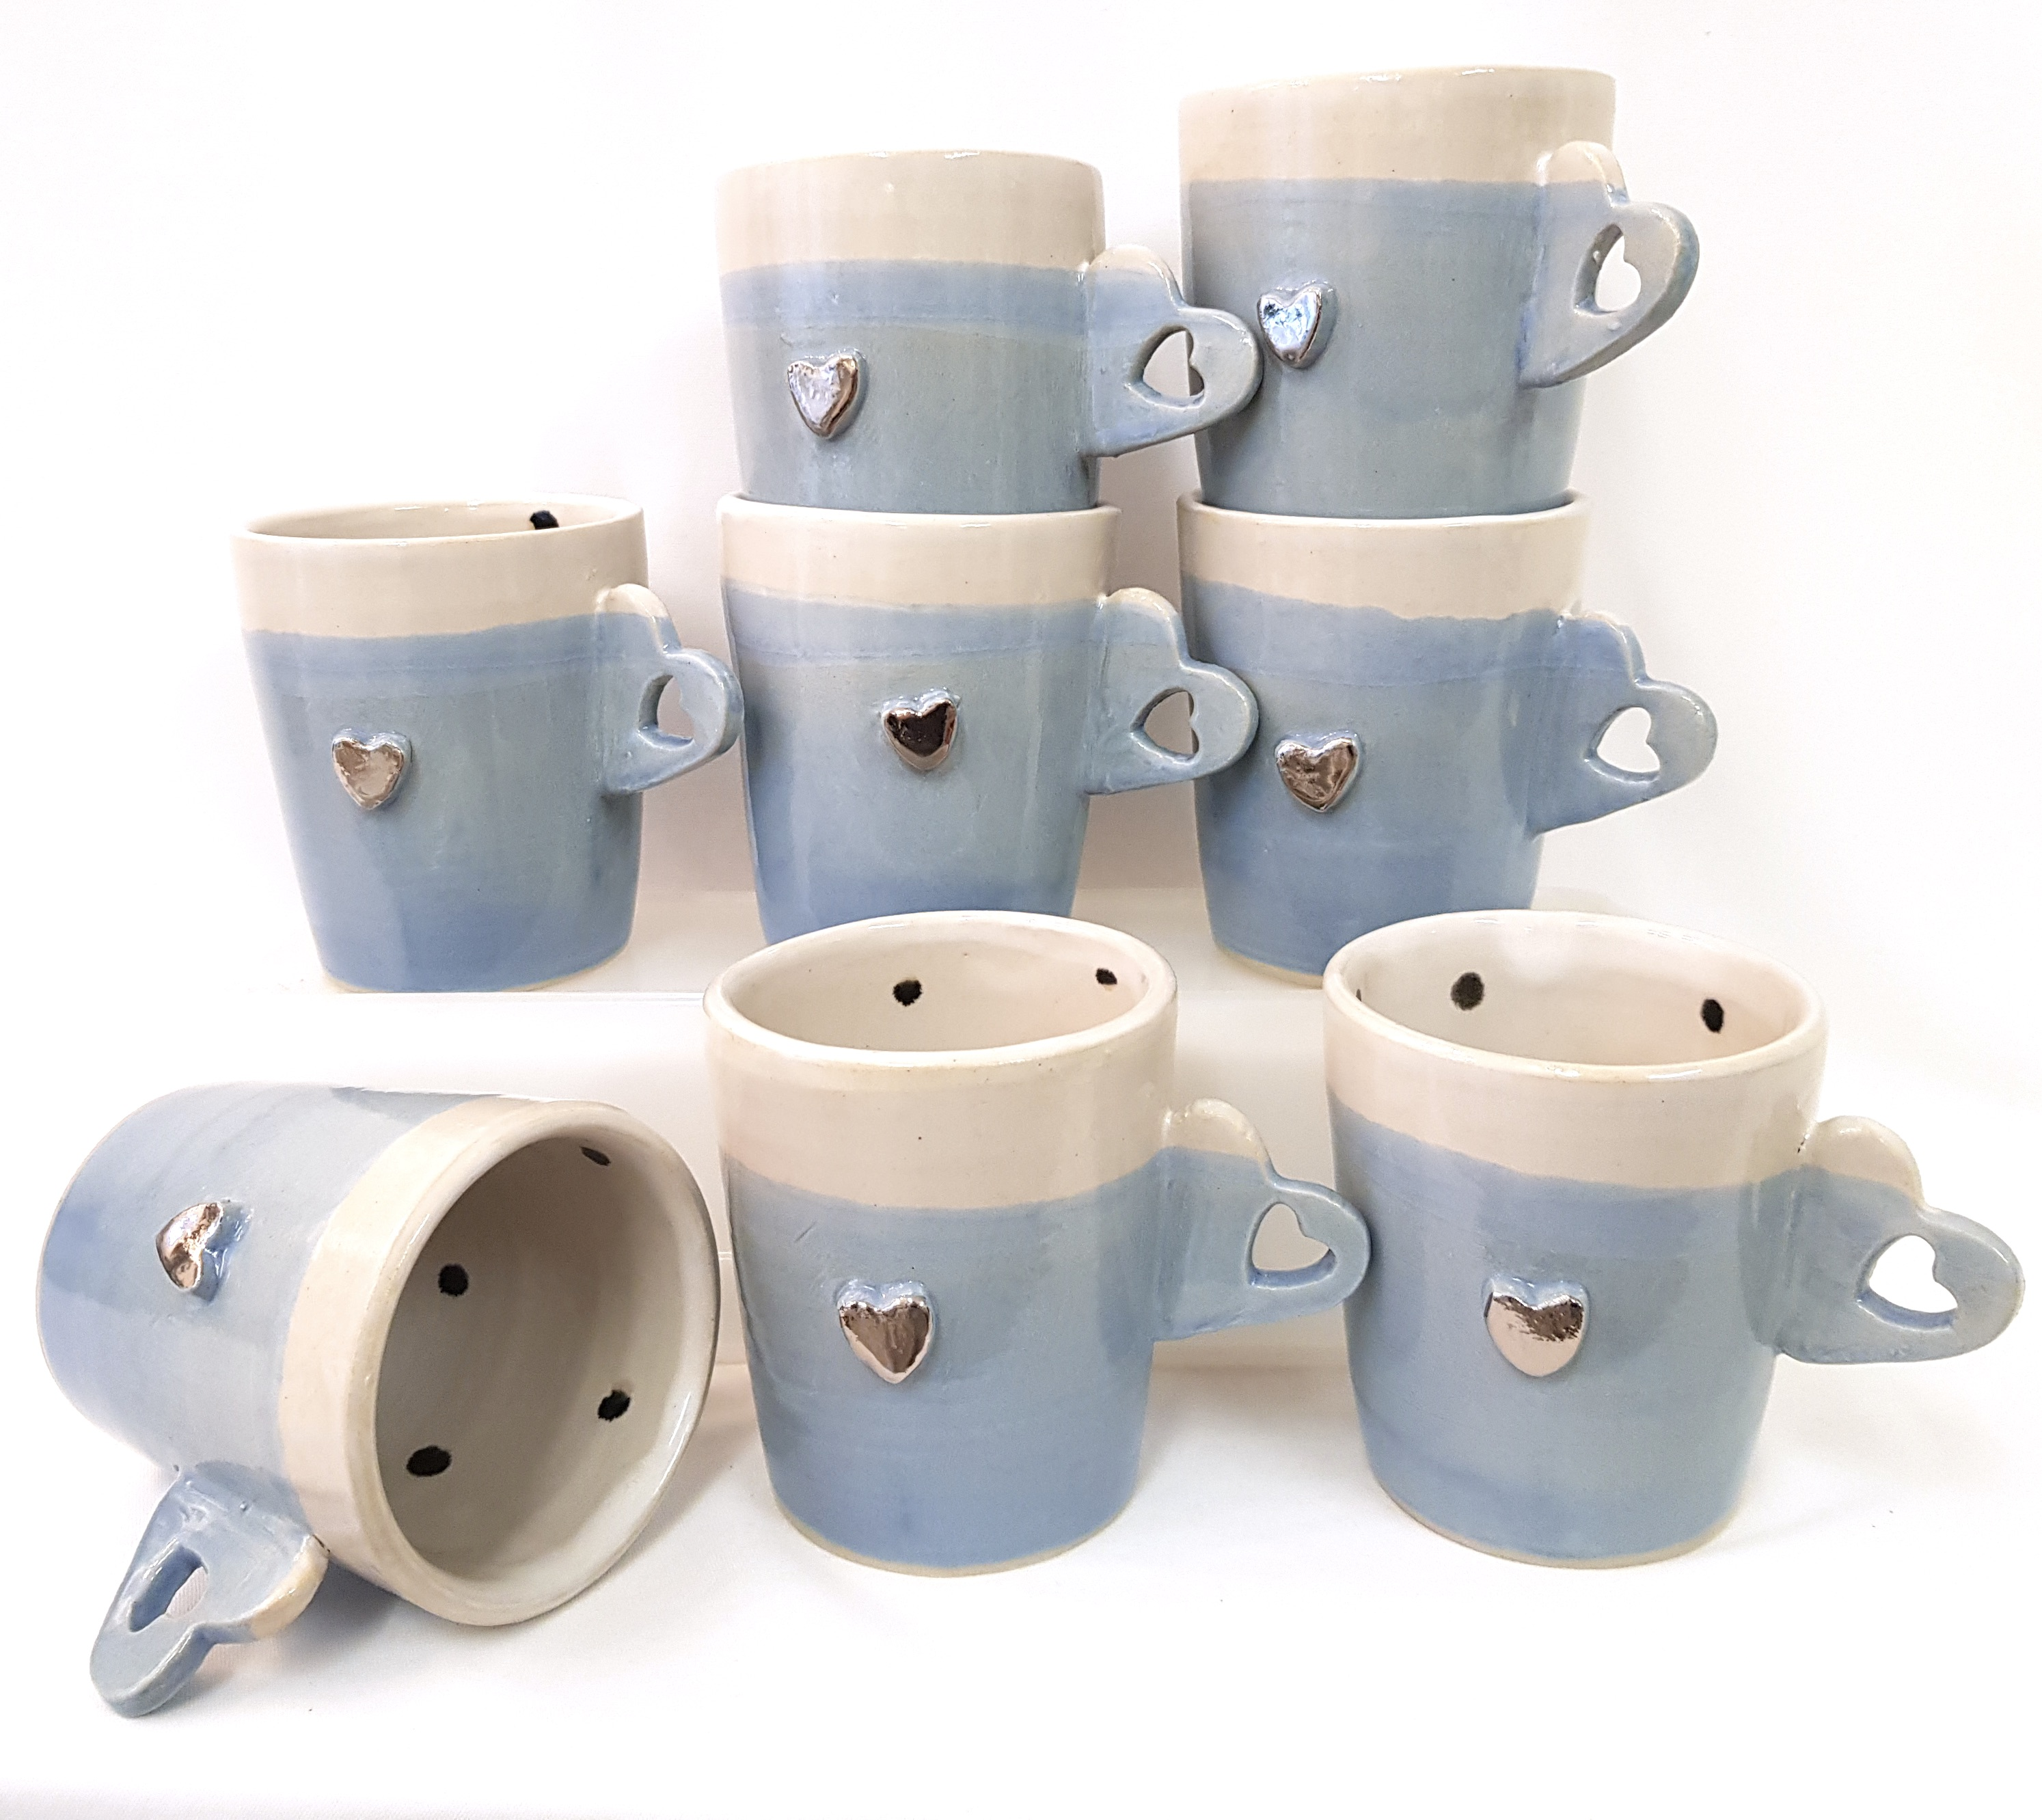 Kaffeetasse Keramik, Unikat, Töpferei la Ceramica Basel, Töpferkurse, Shop, Keramik